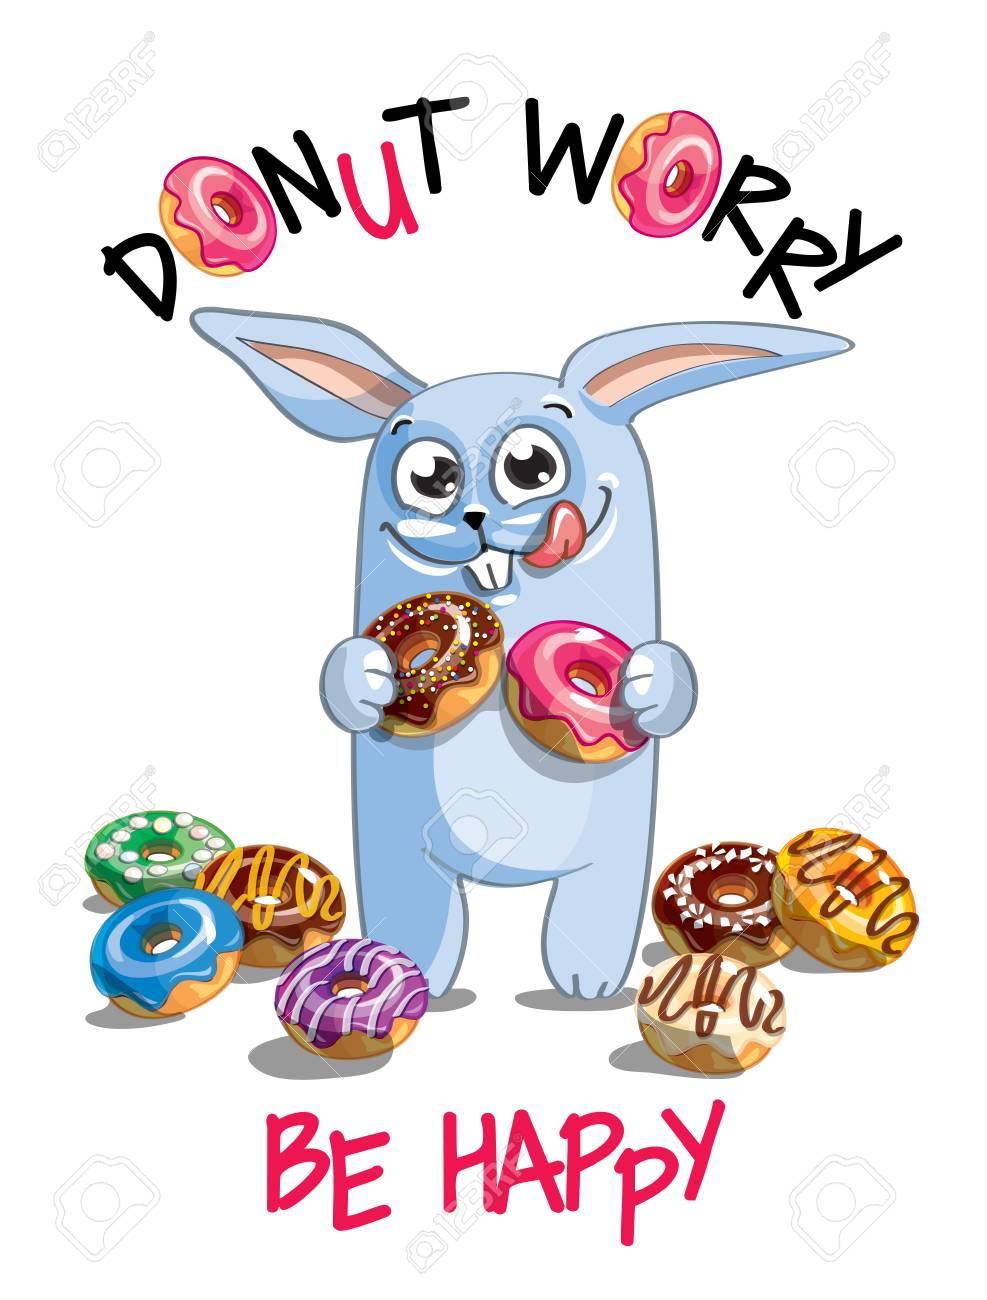 Vector illustration of cartoon rabbit with donuts. - 98677366